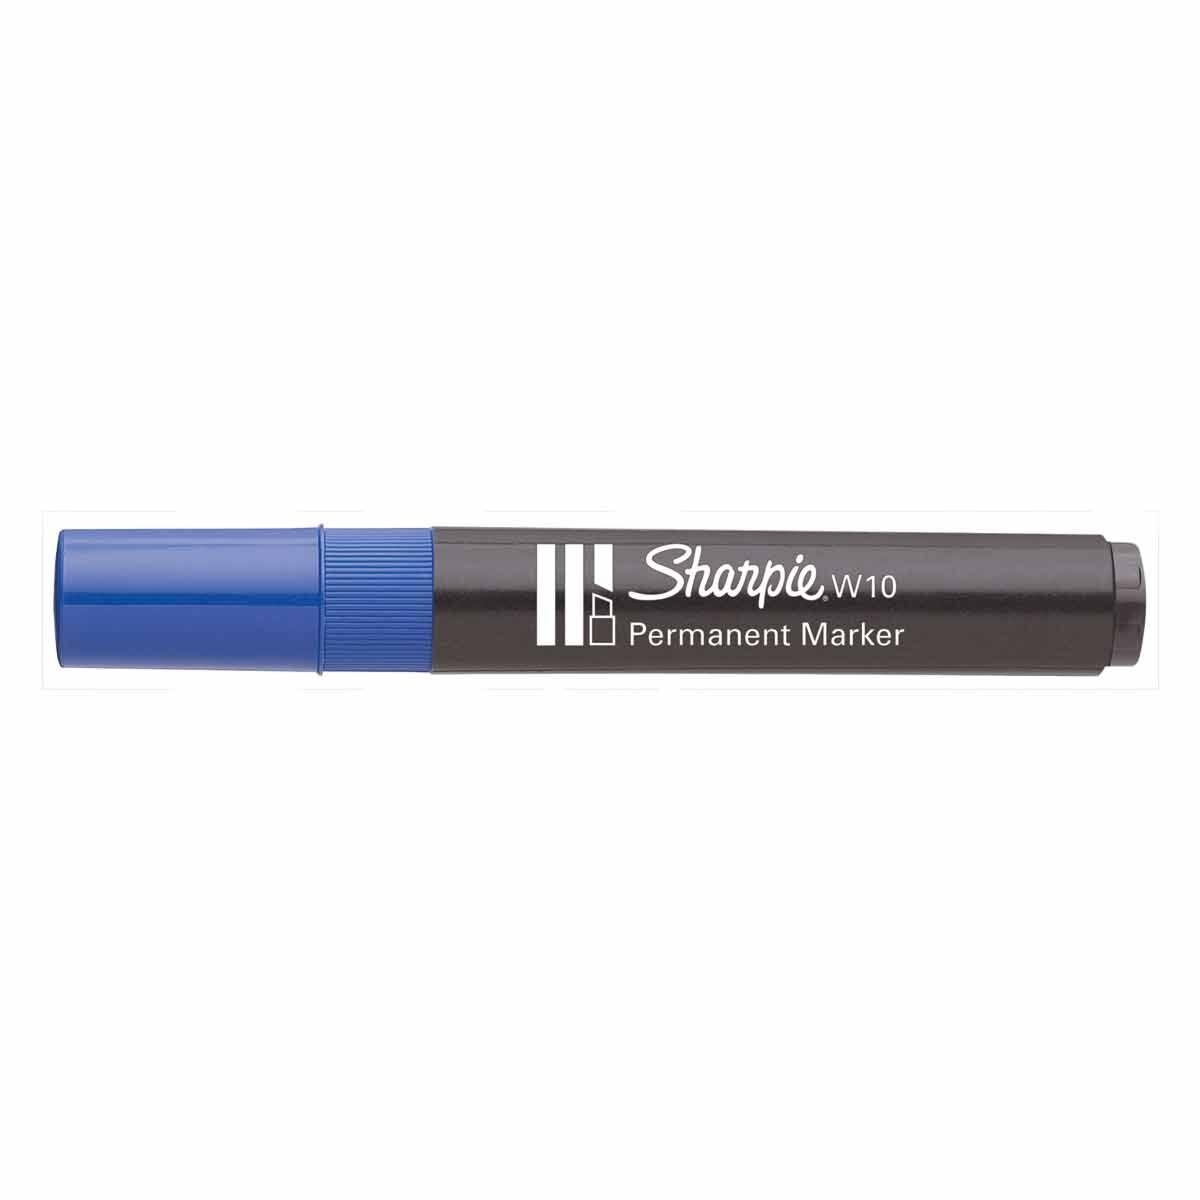 Sharpie W10 Permanent Marker Blue